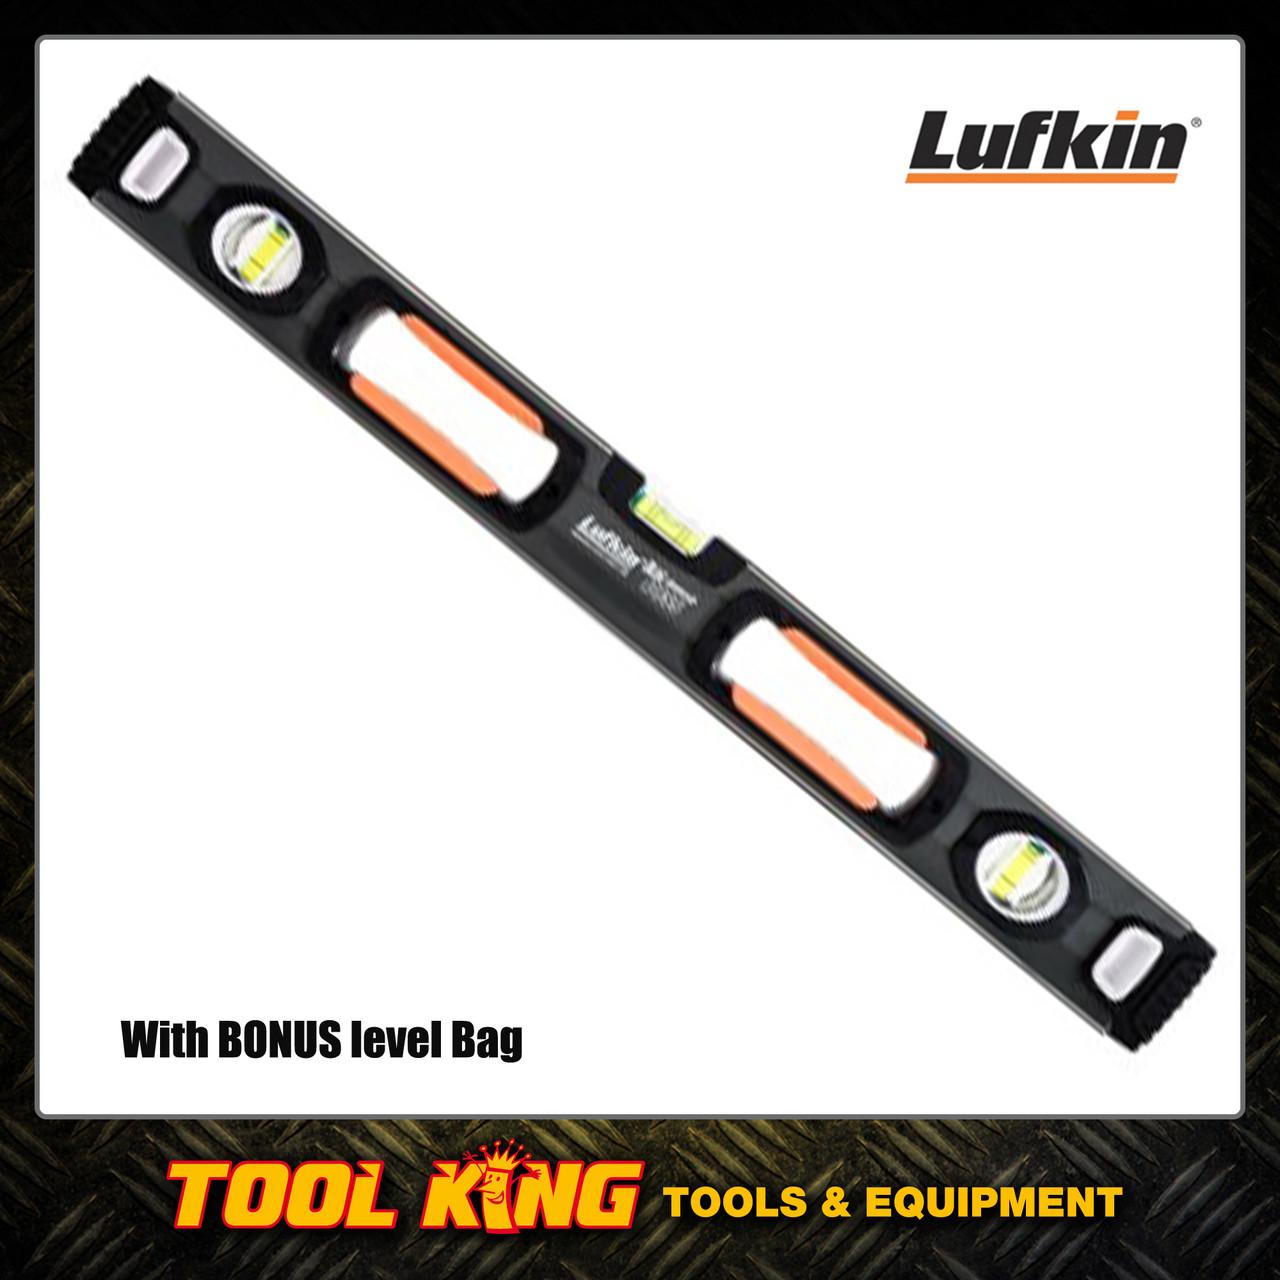 Lufkin Big Boss spirit level 60cm with bag